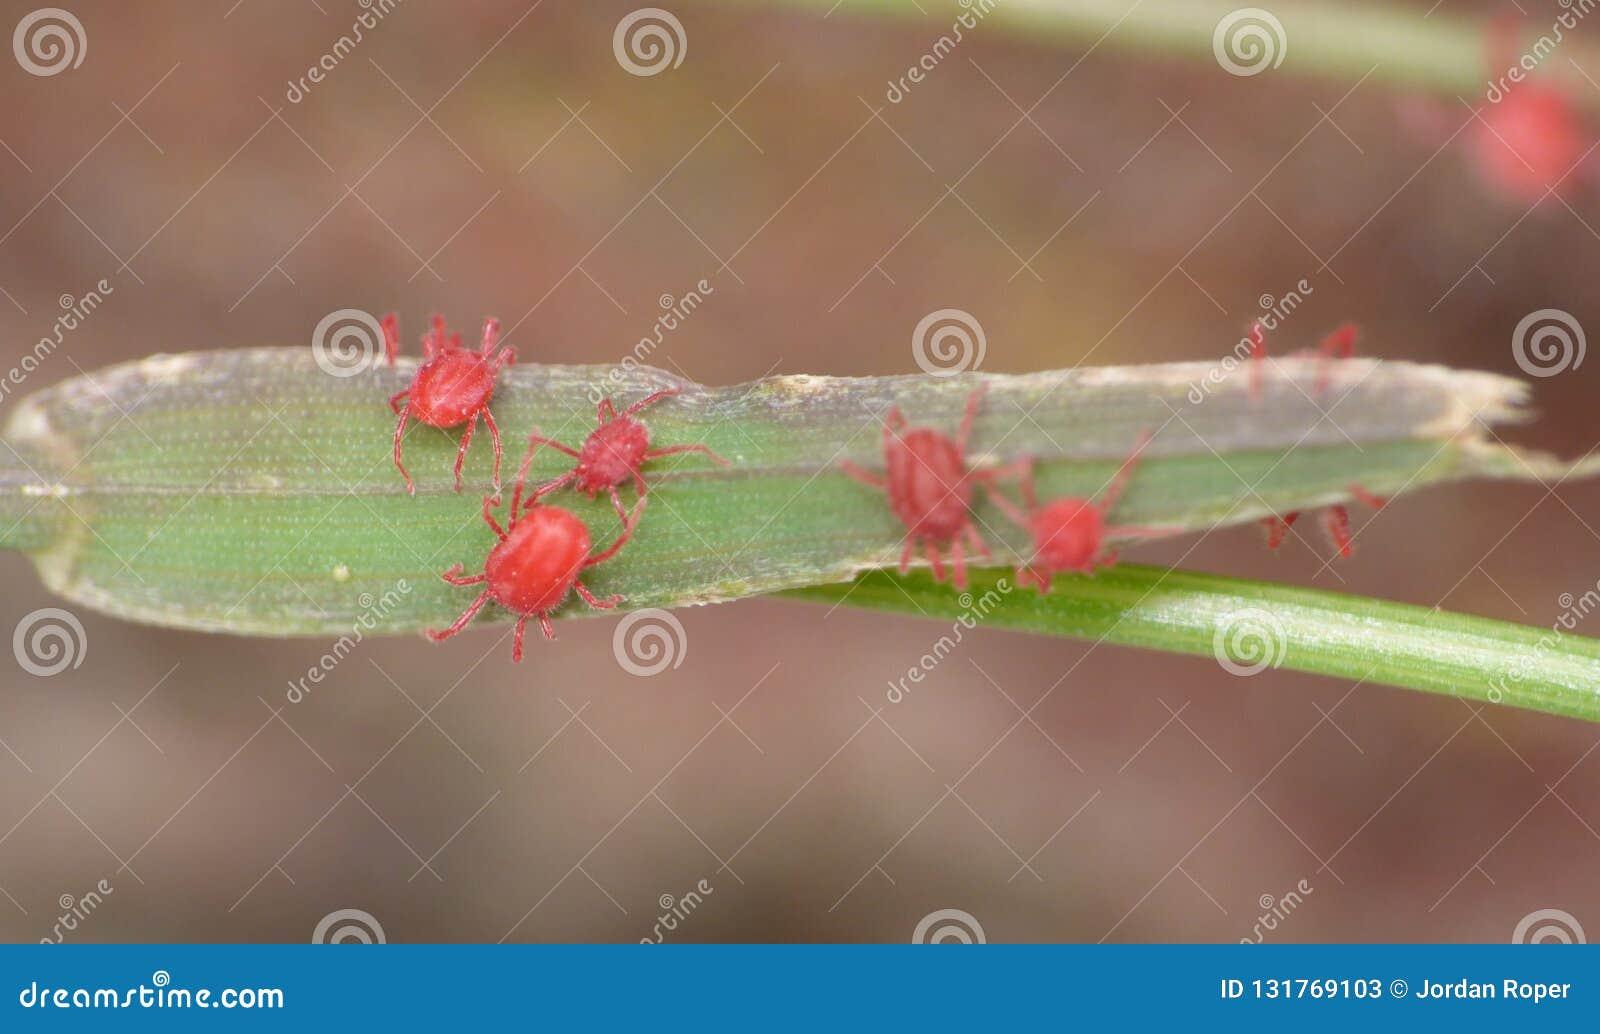 Macro close up of velvet mites blood suckers on leaf, photo taken in the UK